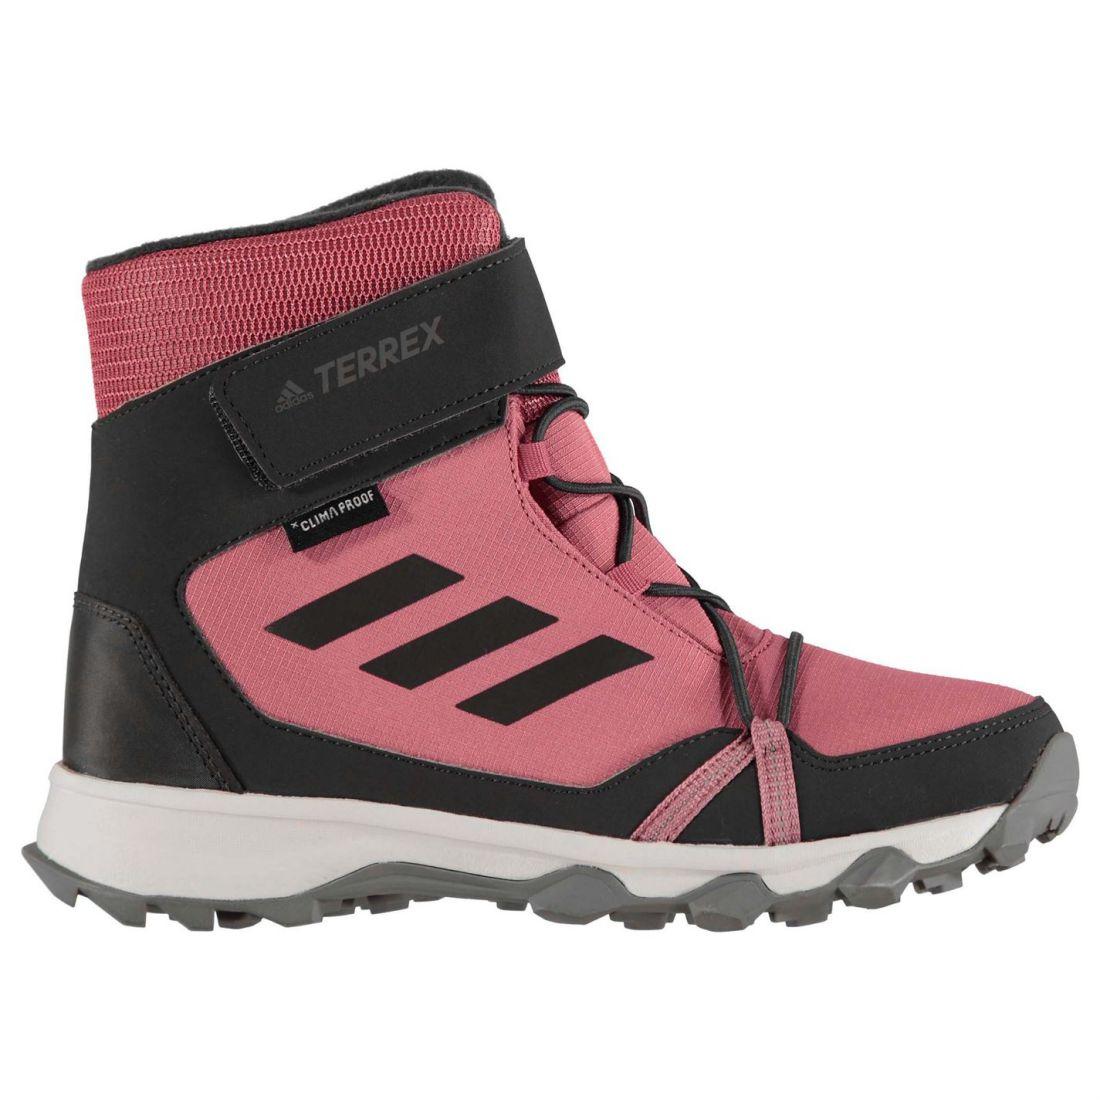 a7f77e43aae adidas Kids Boys Terrex Snow Junior Boots Elasticated Laces Waterproof Strap